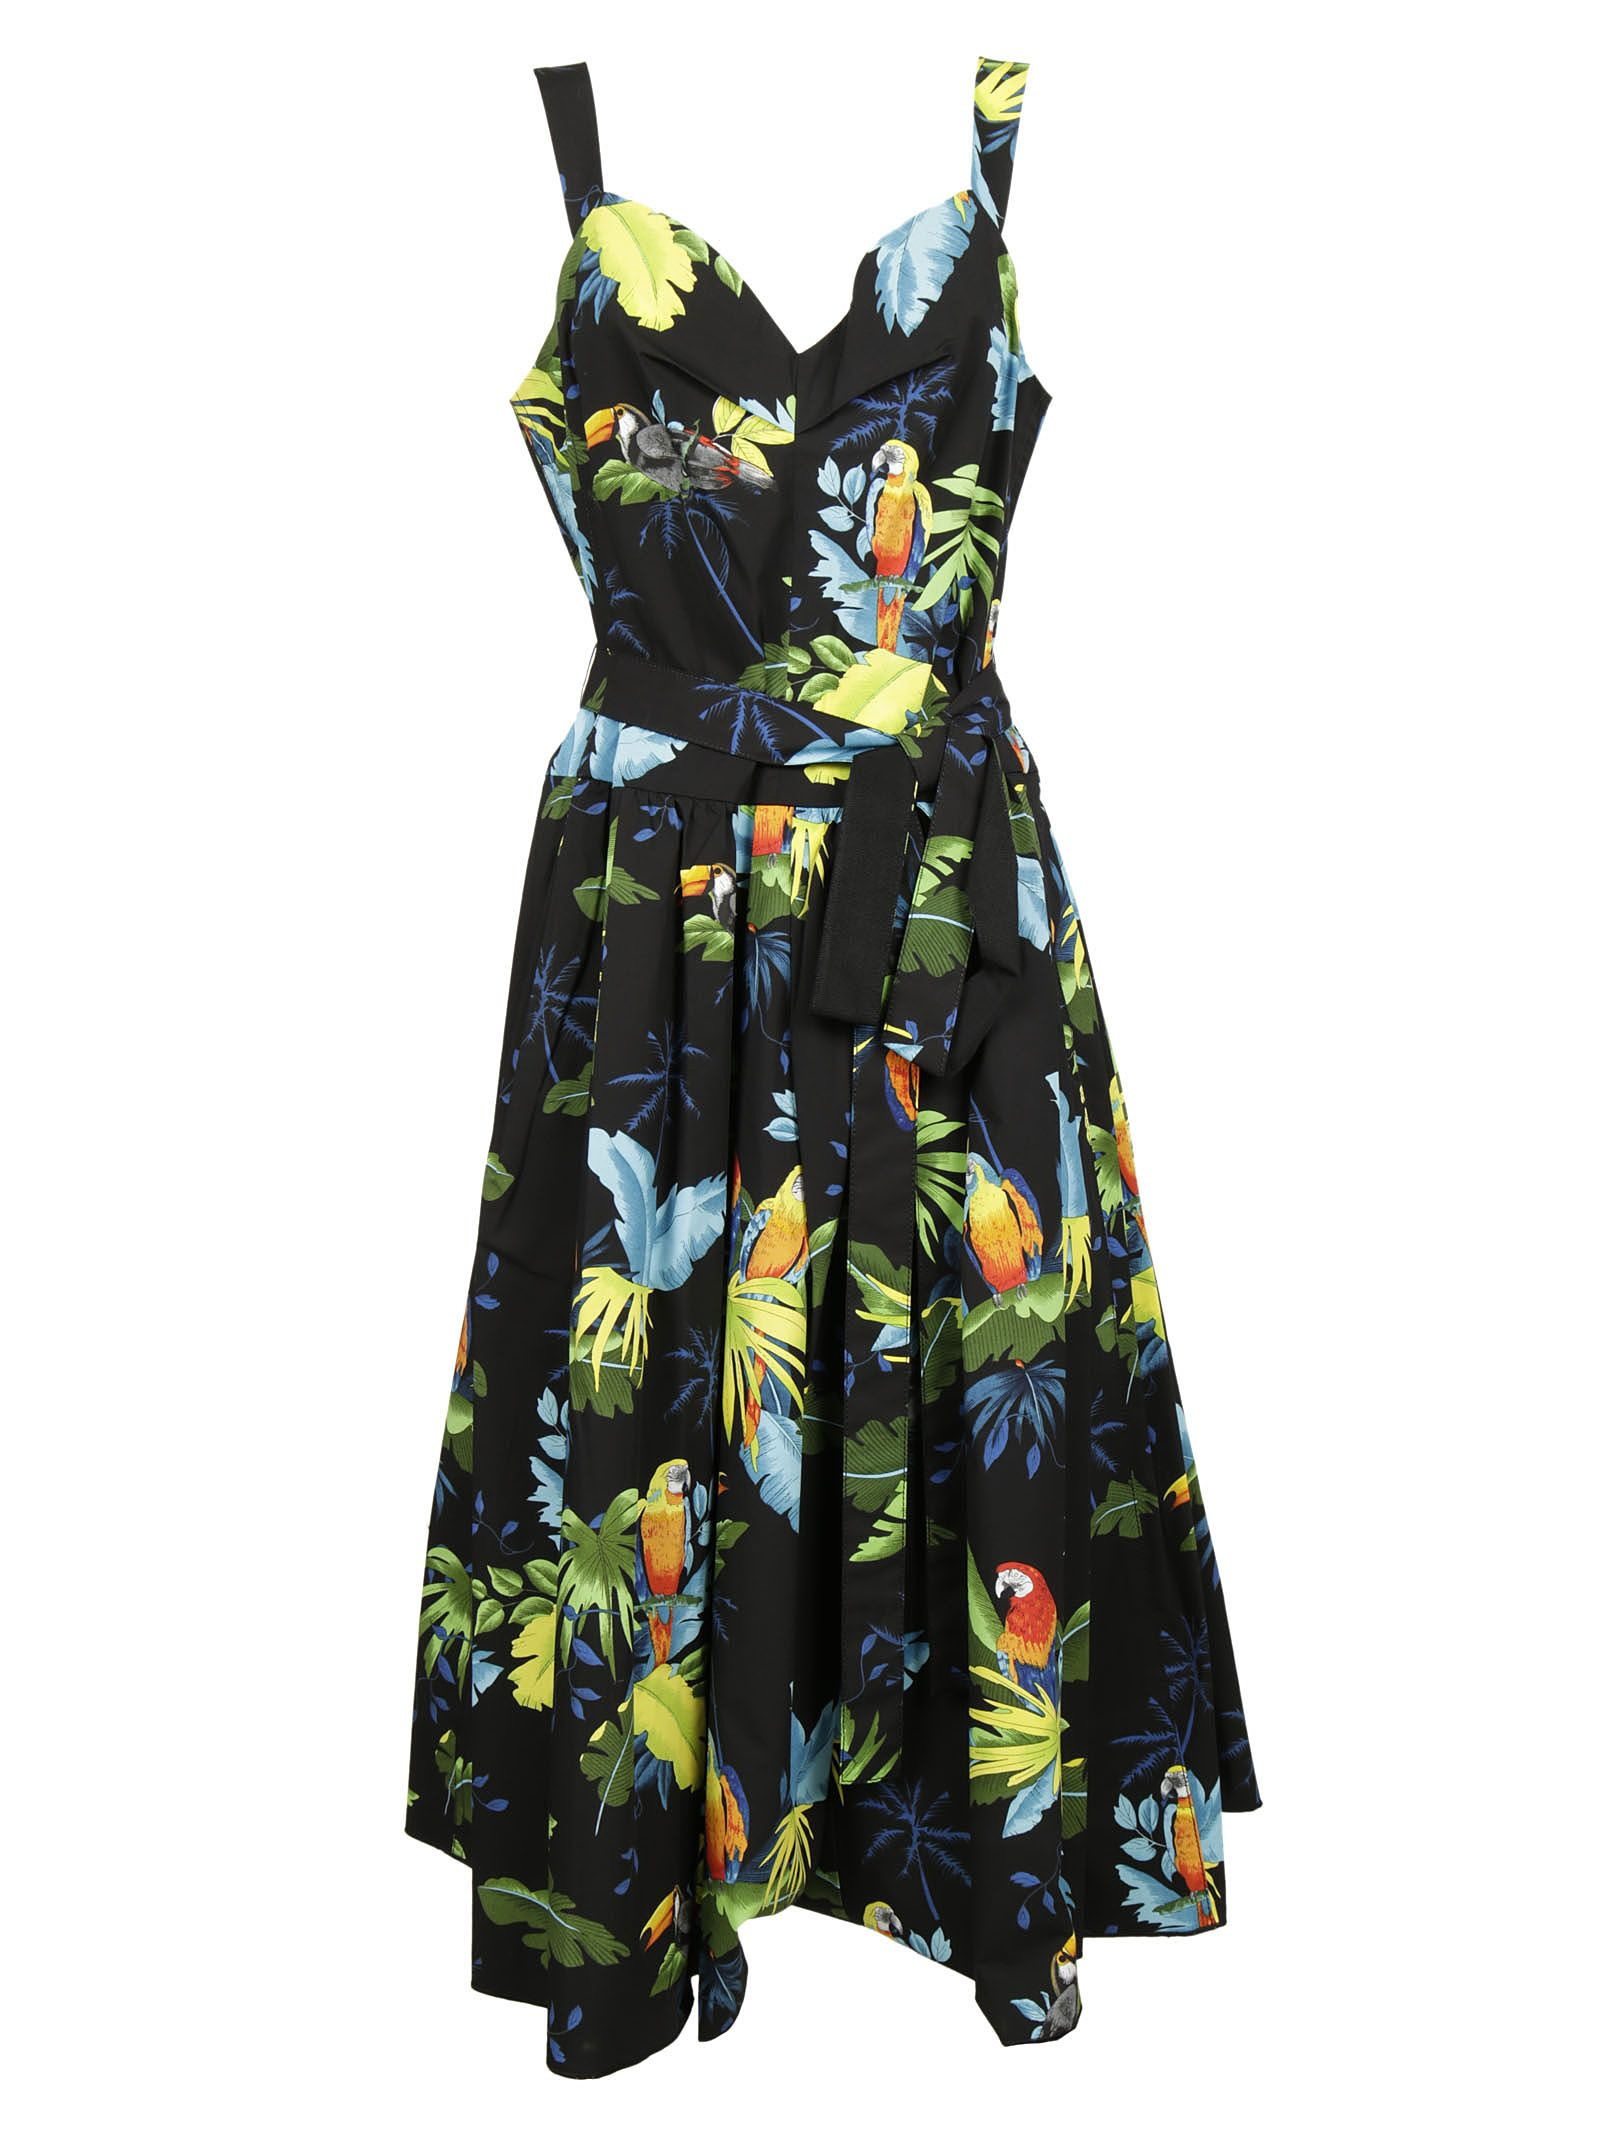 marc jacobs female marc jacobs tropical print dress